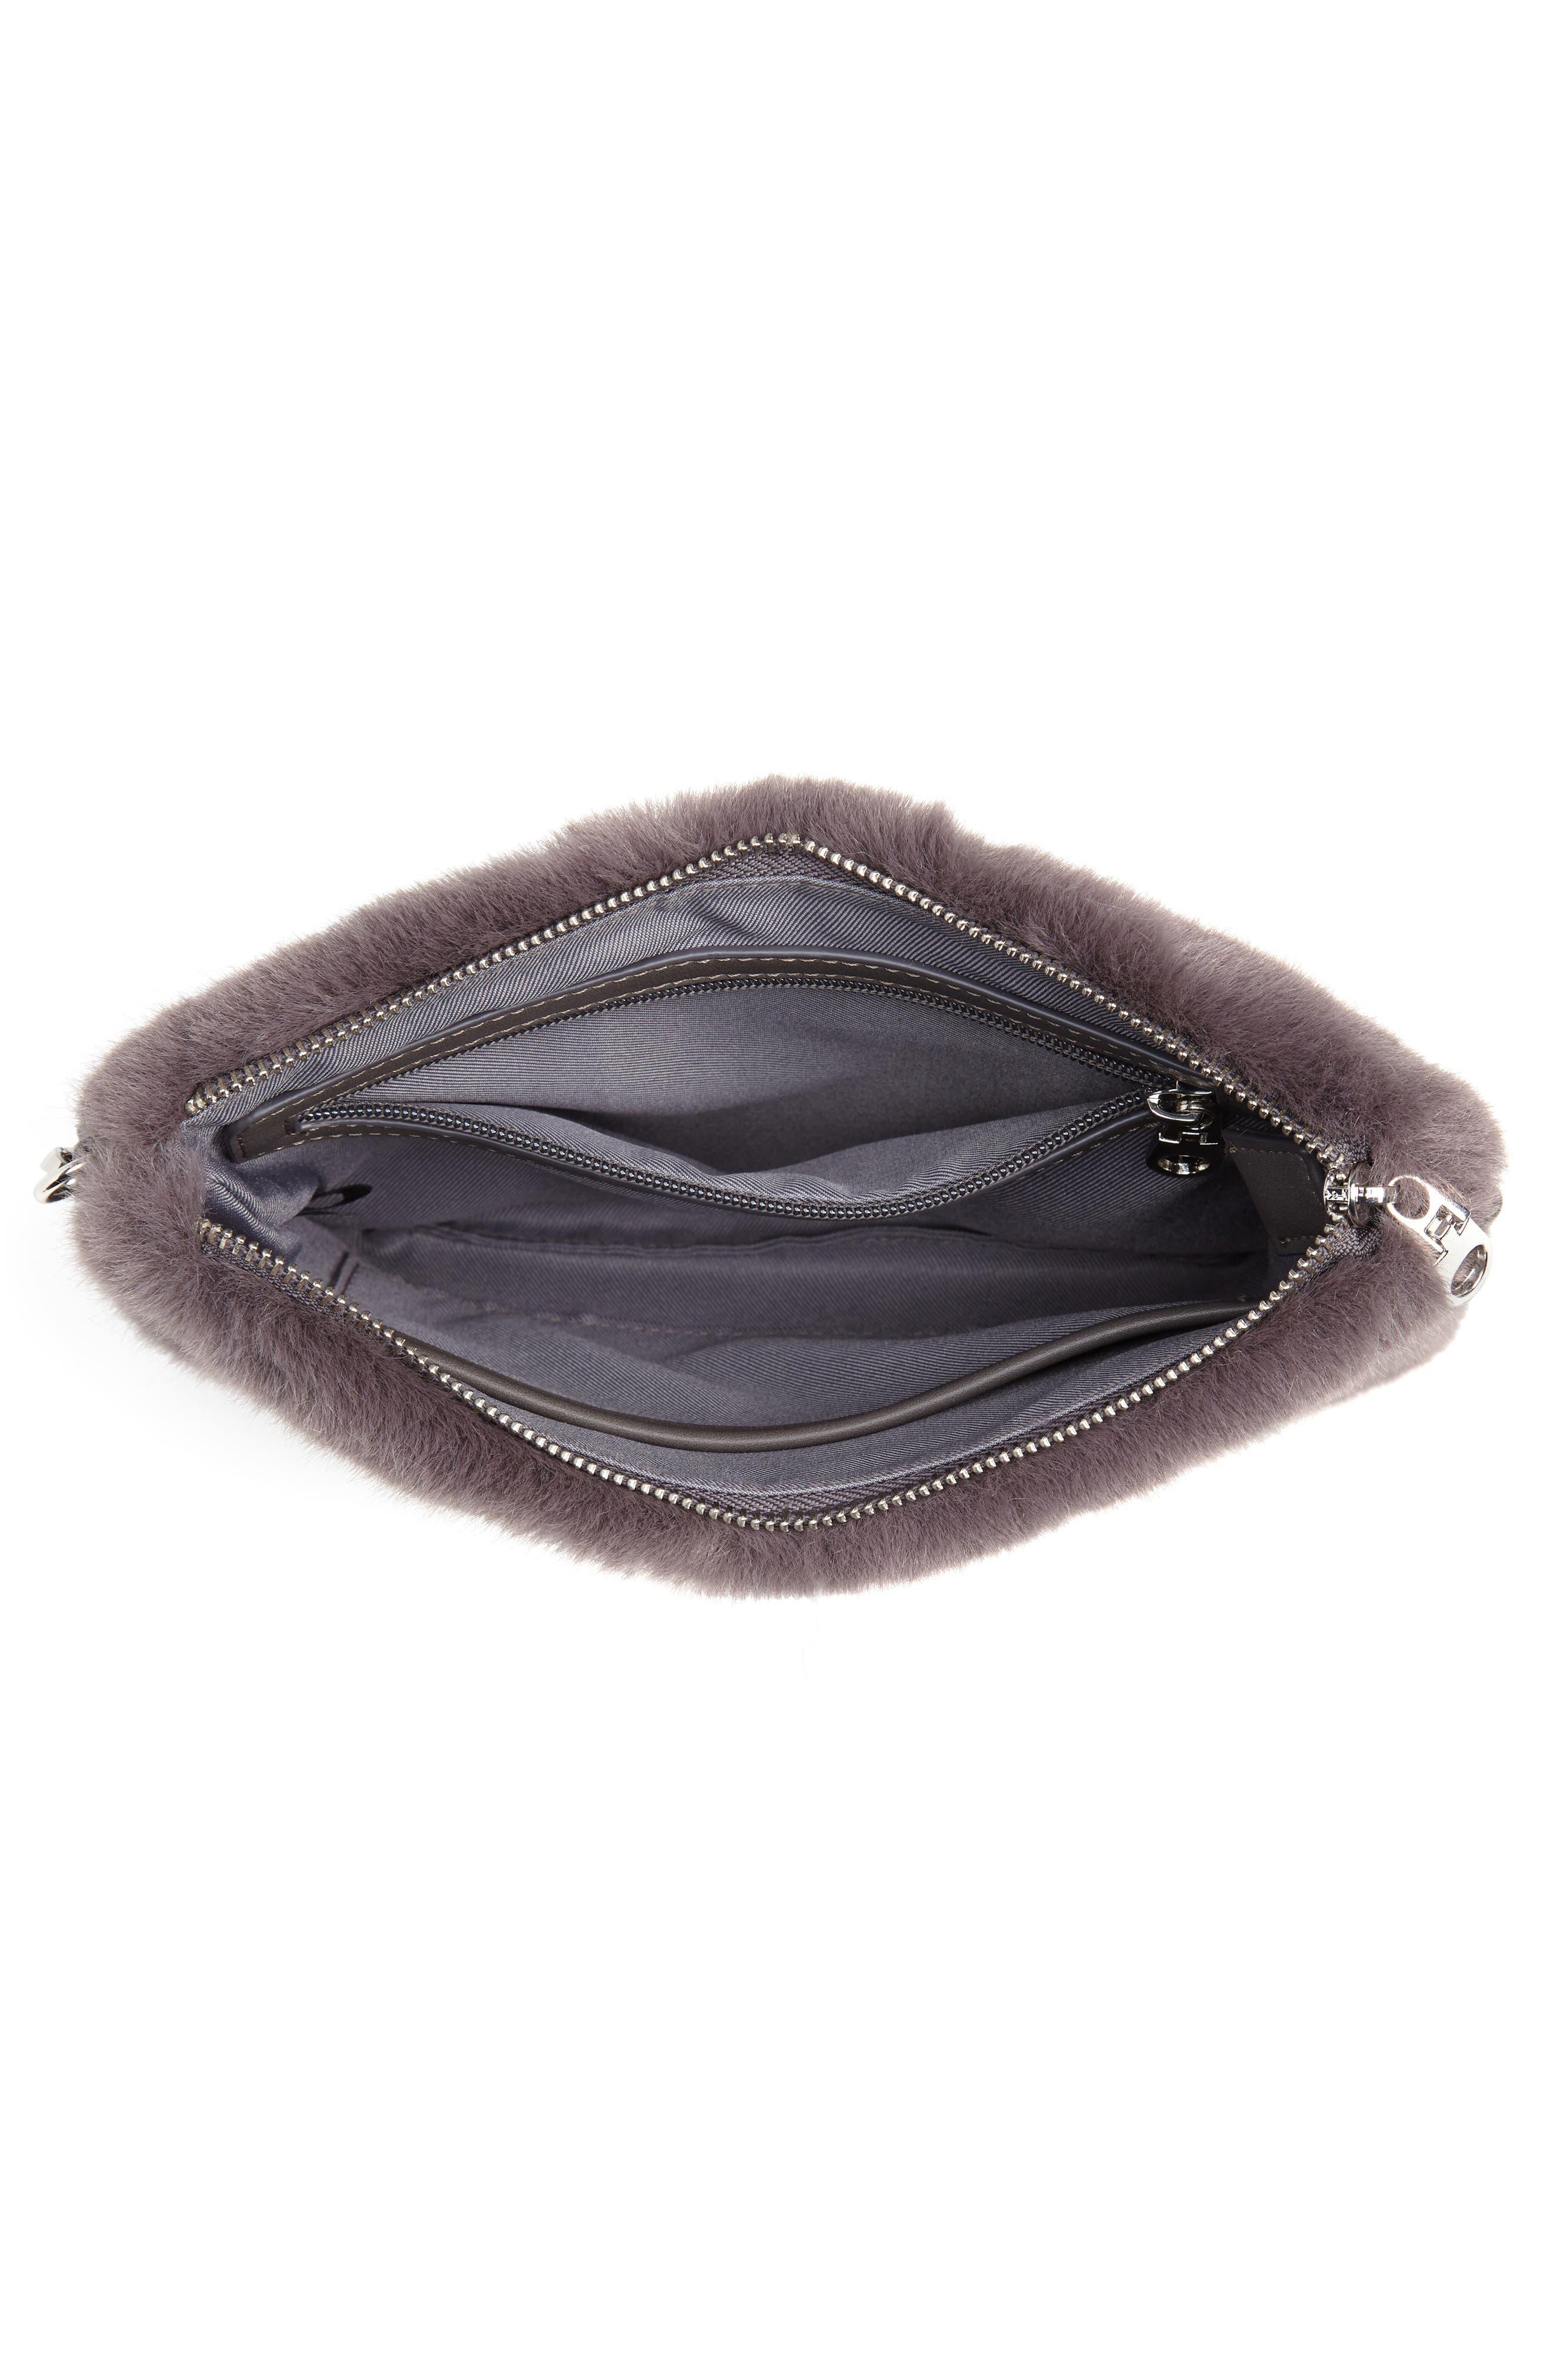 Astley Faux Fur Convertible Clutch,                             Alternate thumbnail 5, color,                             GREY CASTLEROCK